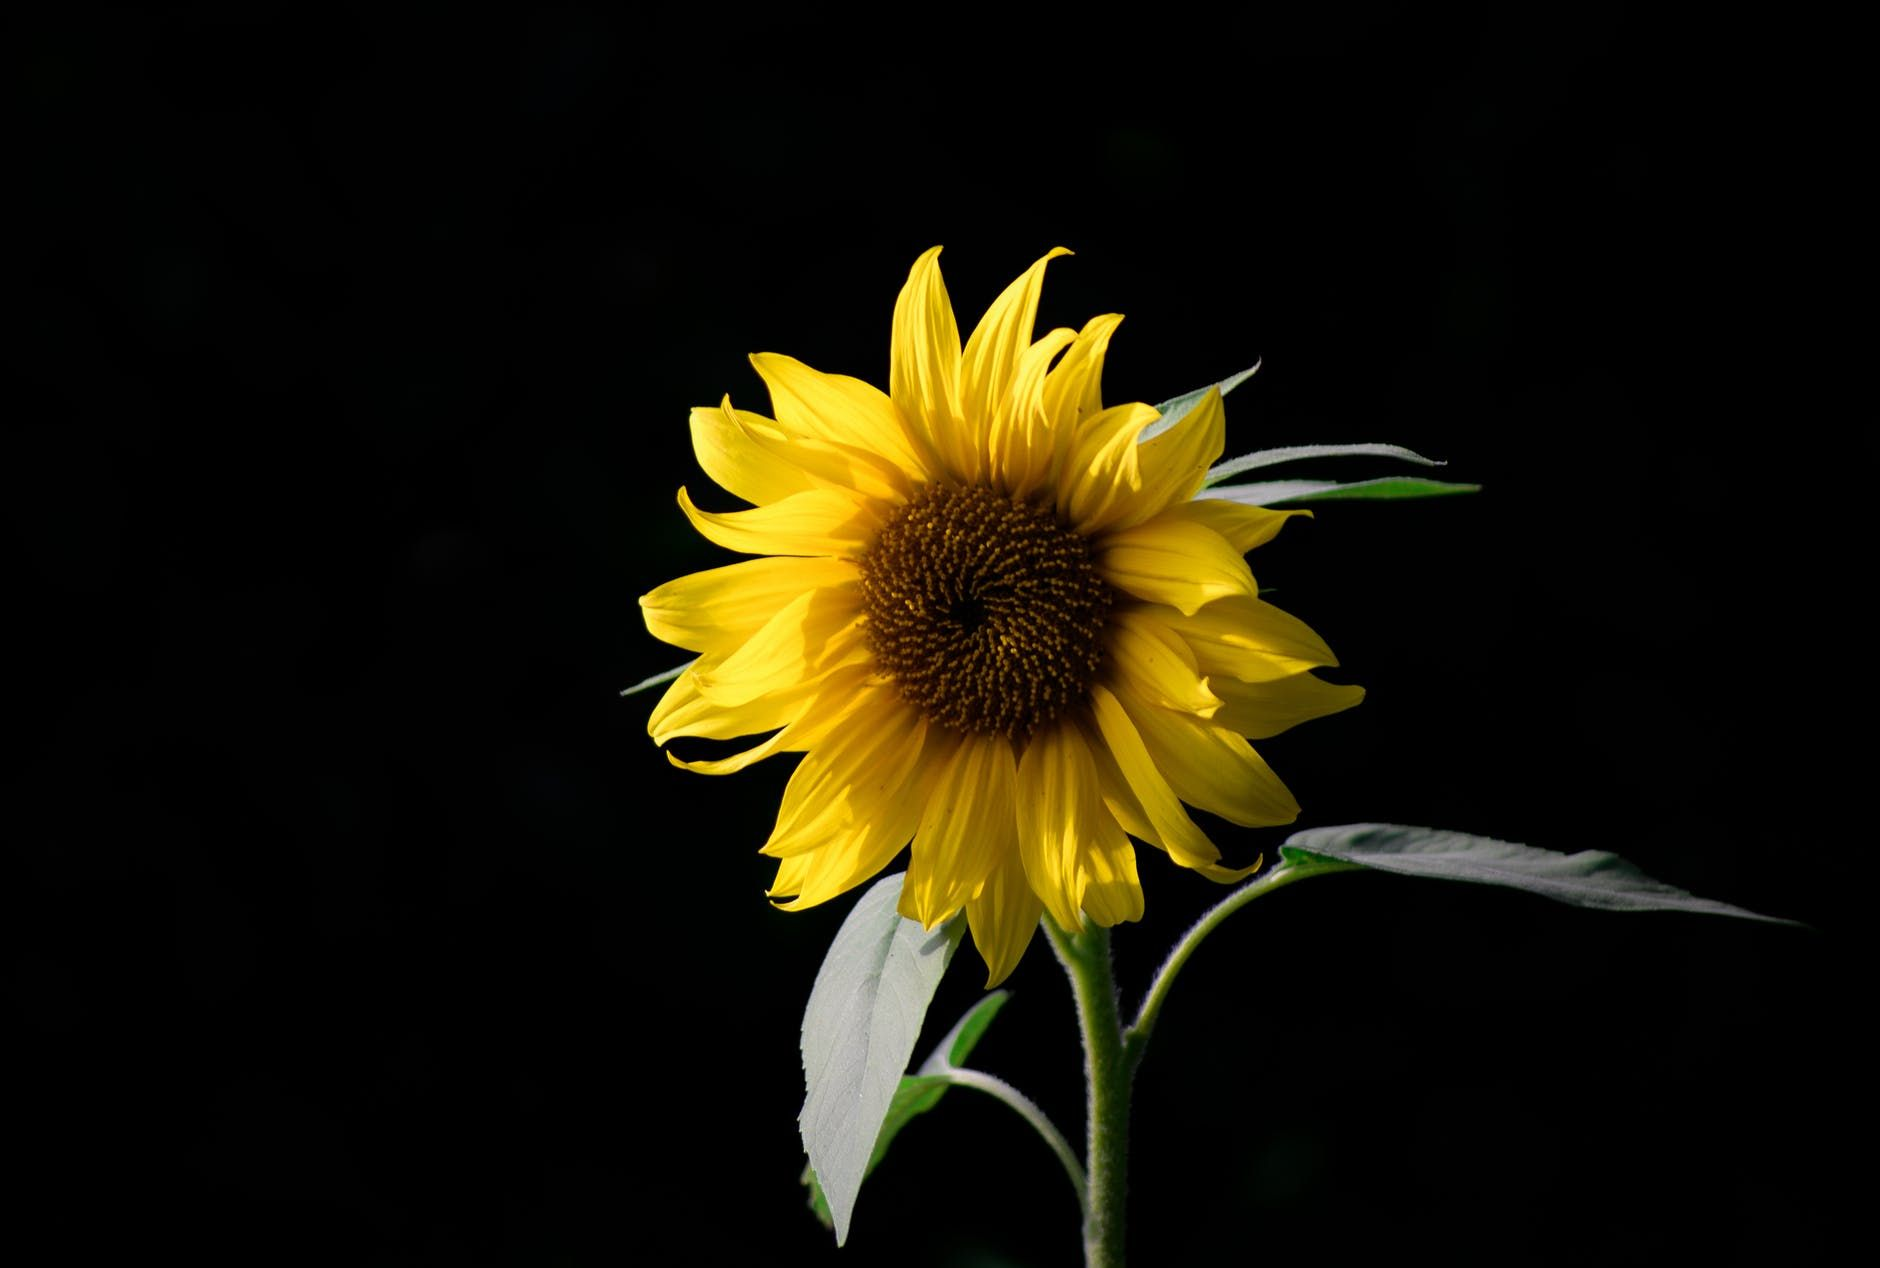 Sleepless Sunflower Poem Sunflower Wallpaper Sunflowers Background Black Flowers Wallpaper